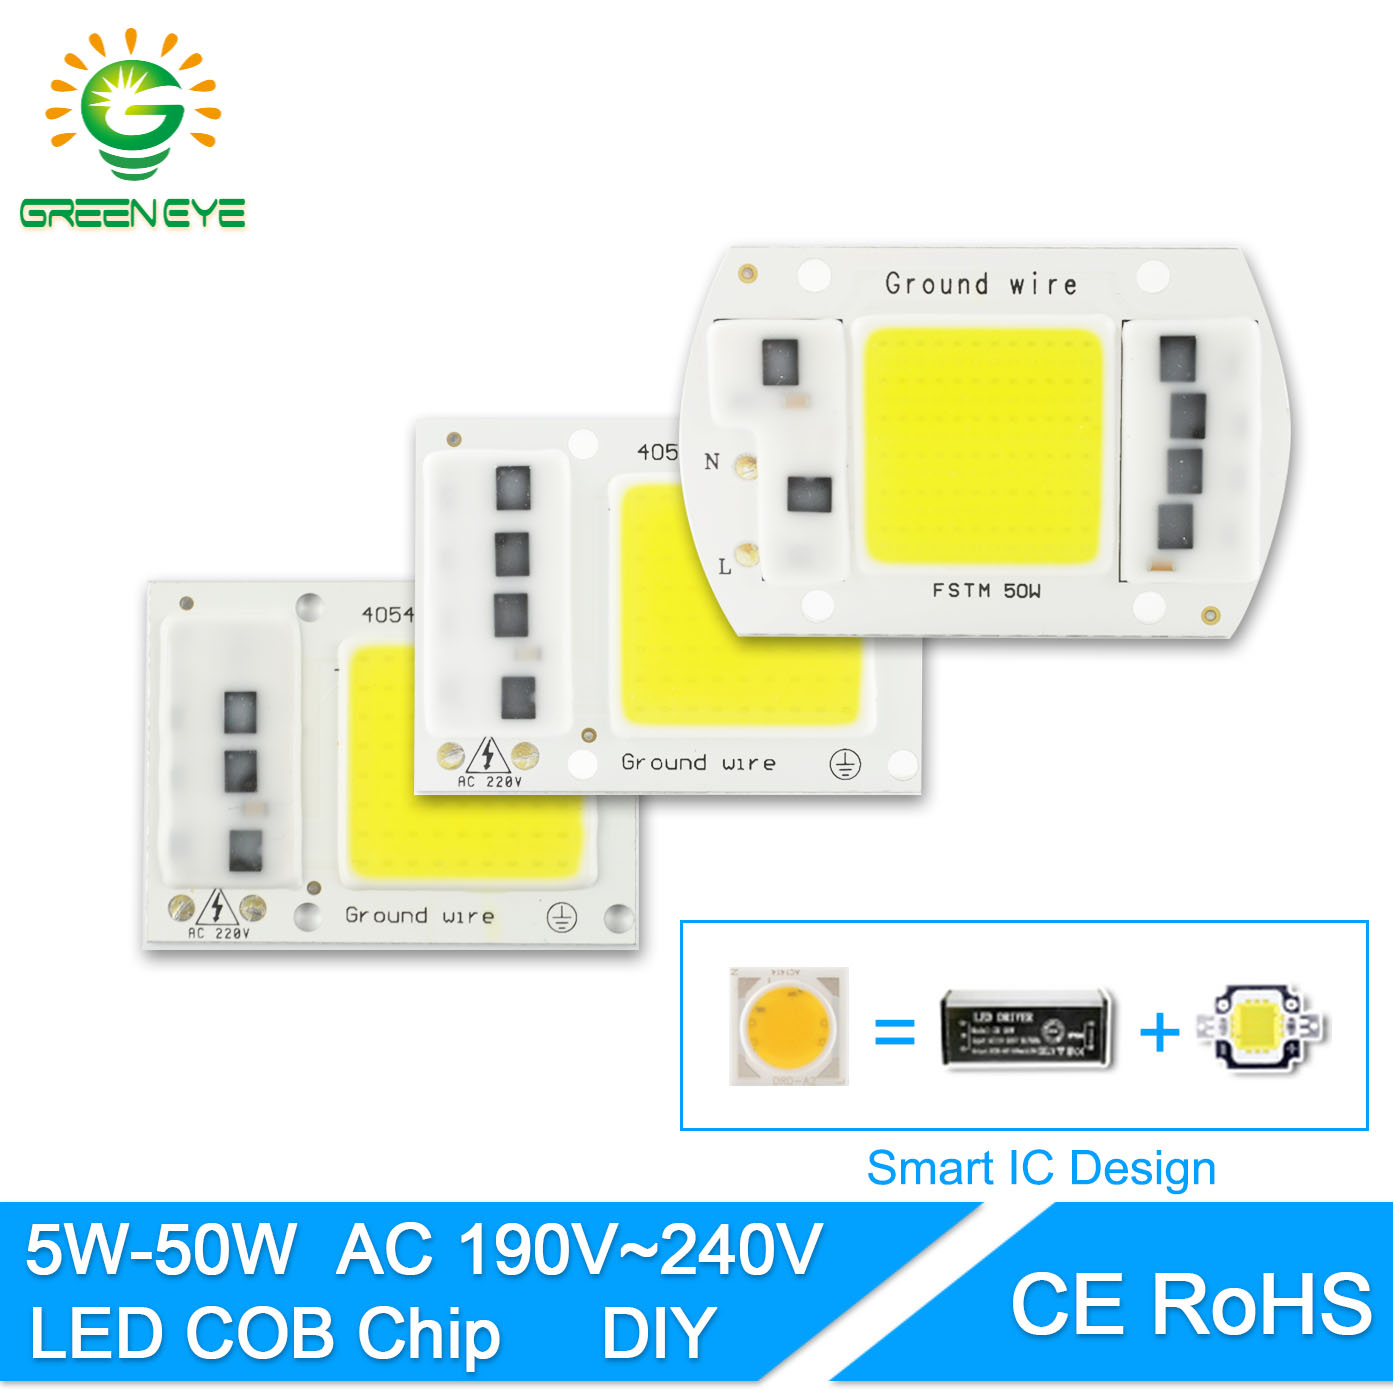 GreenEye AC 220V Integrated COB LED Lamp Chip 50W 30W 20W 10W 5W Smart IC Driver High Lumens For DIY Floodlight Spotlight(China (Mainland))